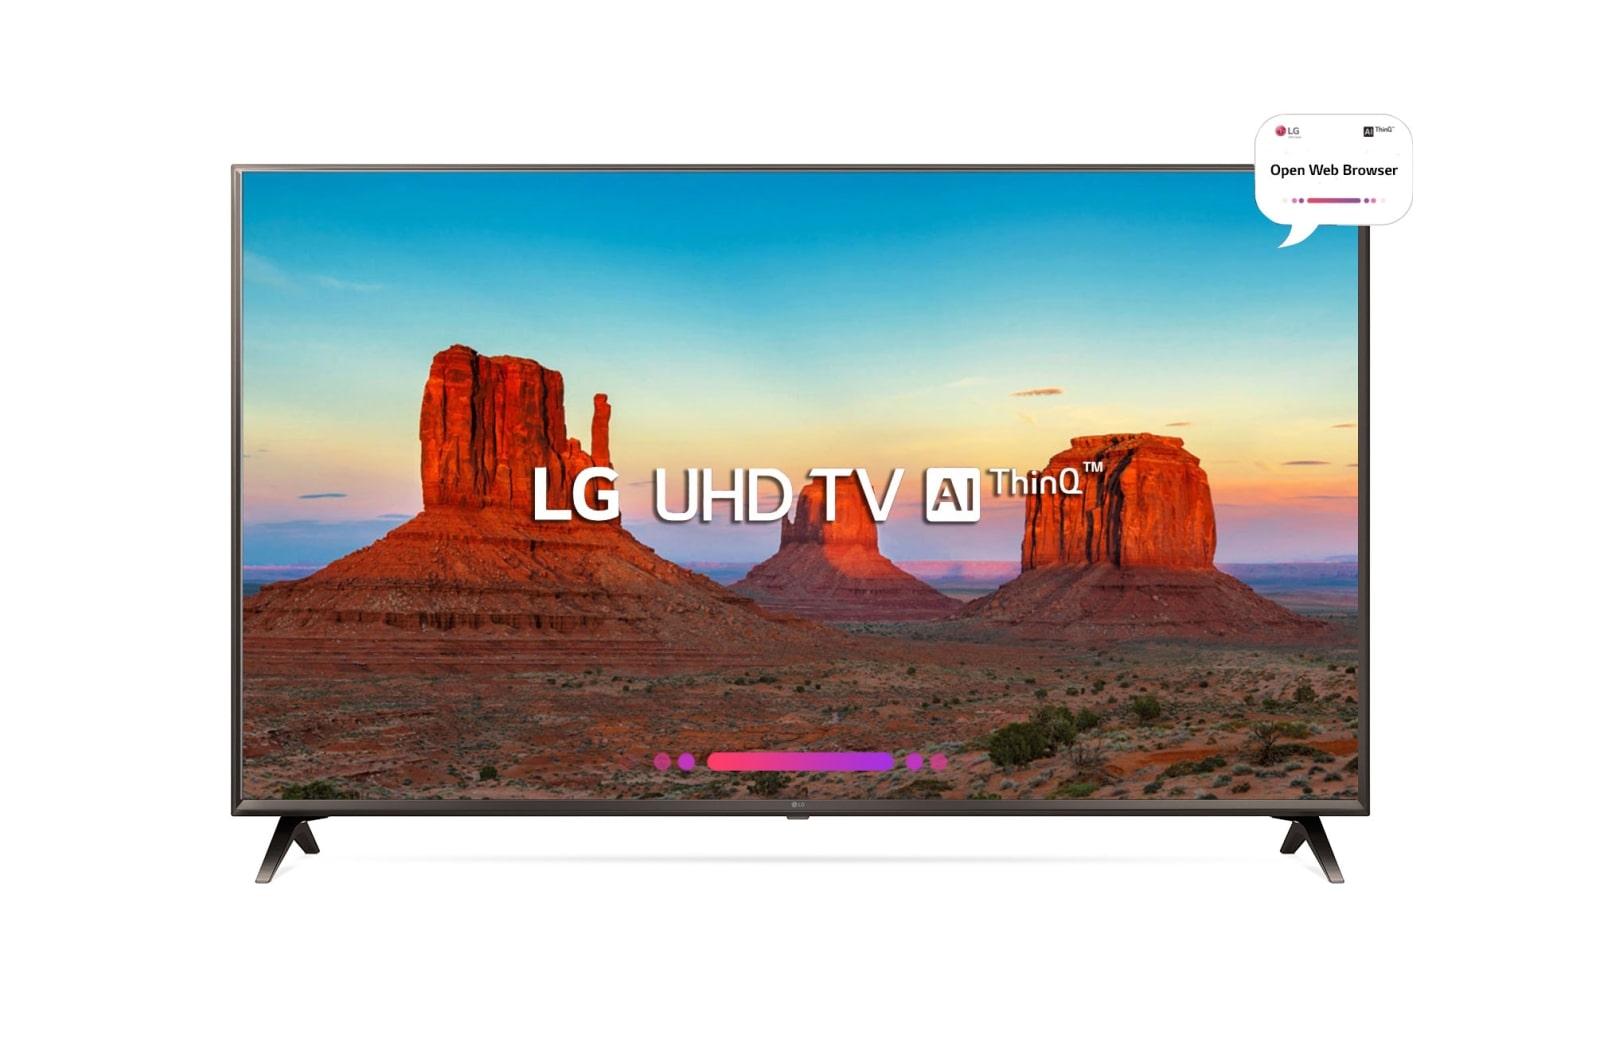 LG Smart 165 cm (65 inch) 4K (Ultra HD) LED TV - 65UK6360PTE